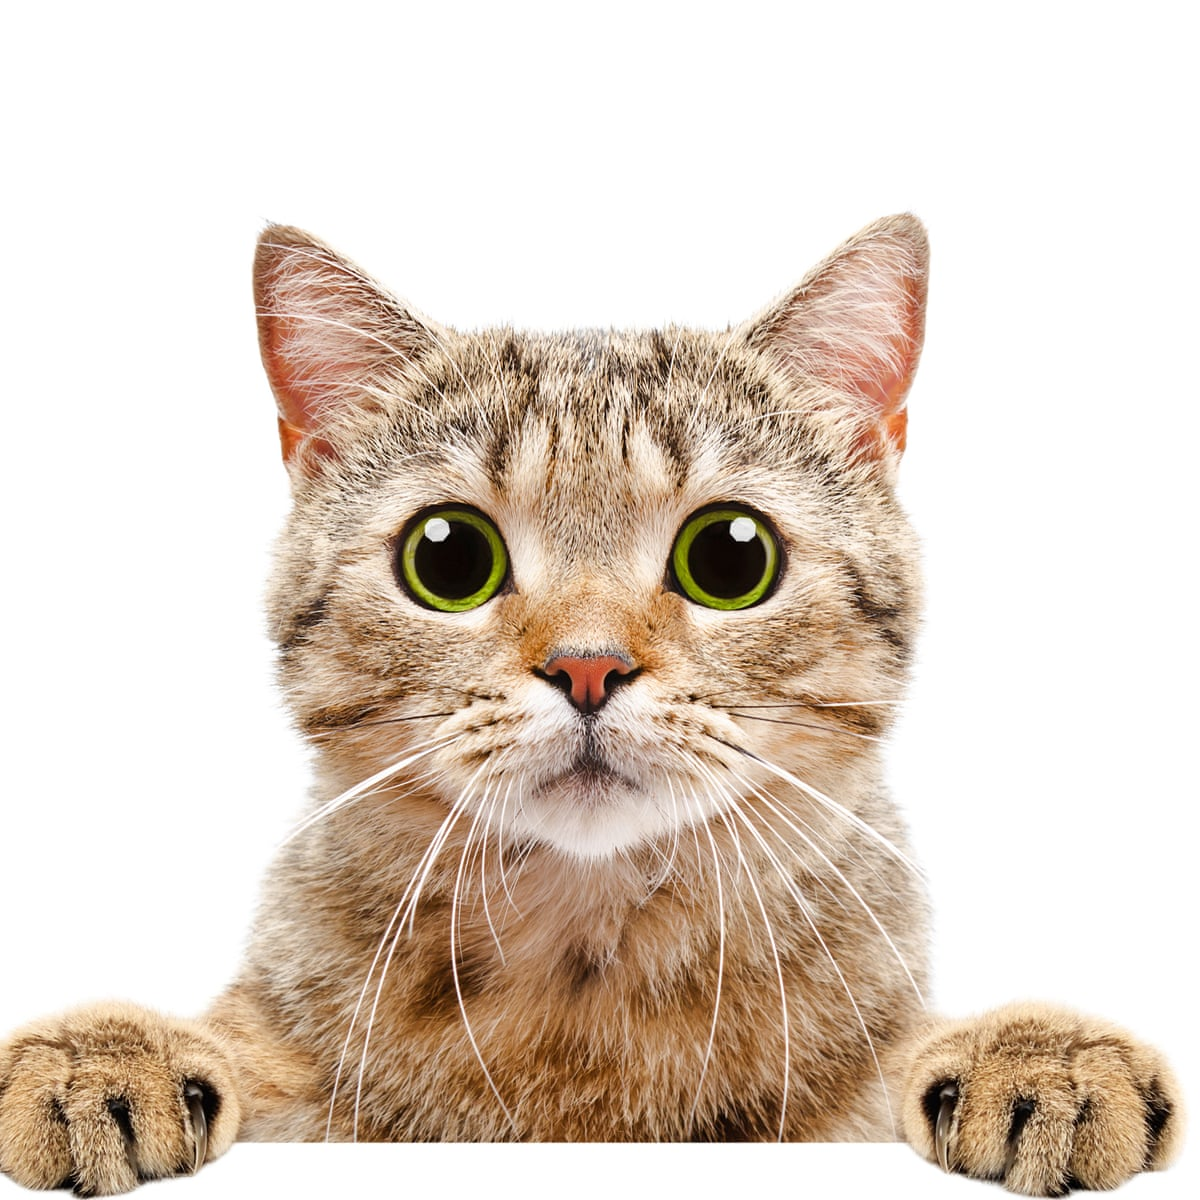 Download Adorable Cat Pictures Photos Images FXnrFlTfl